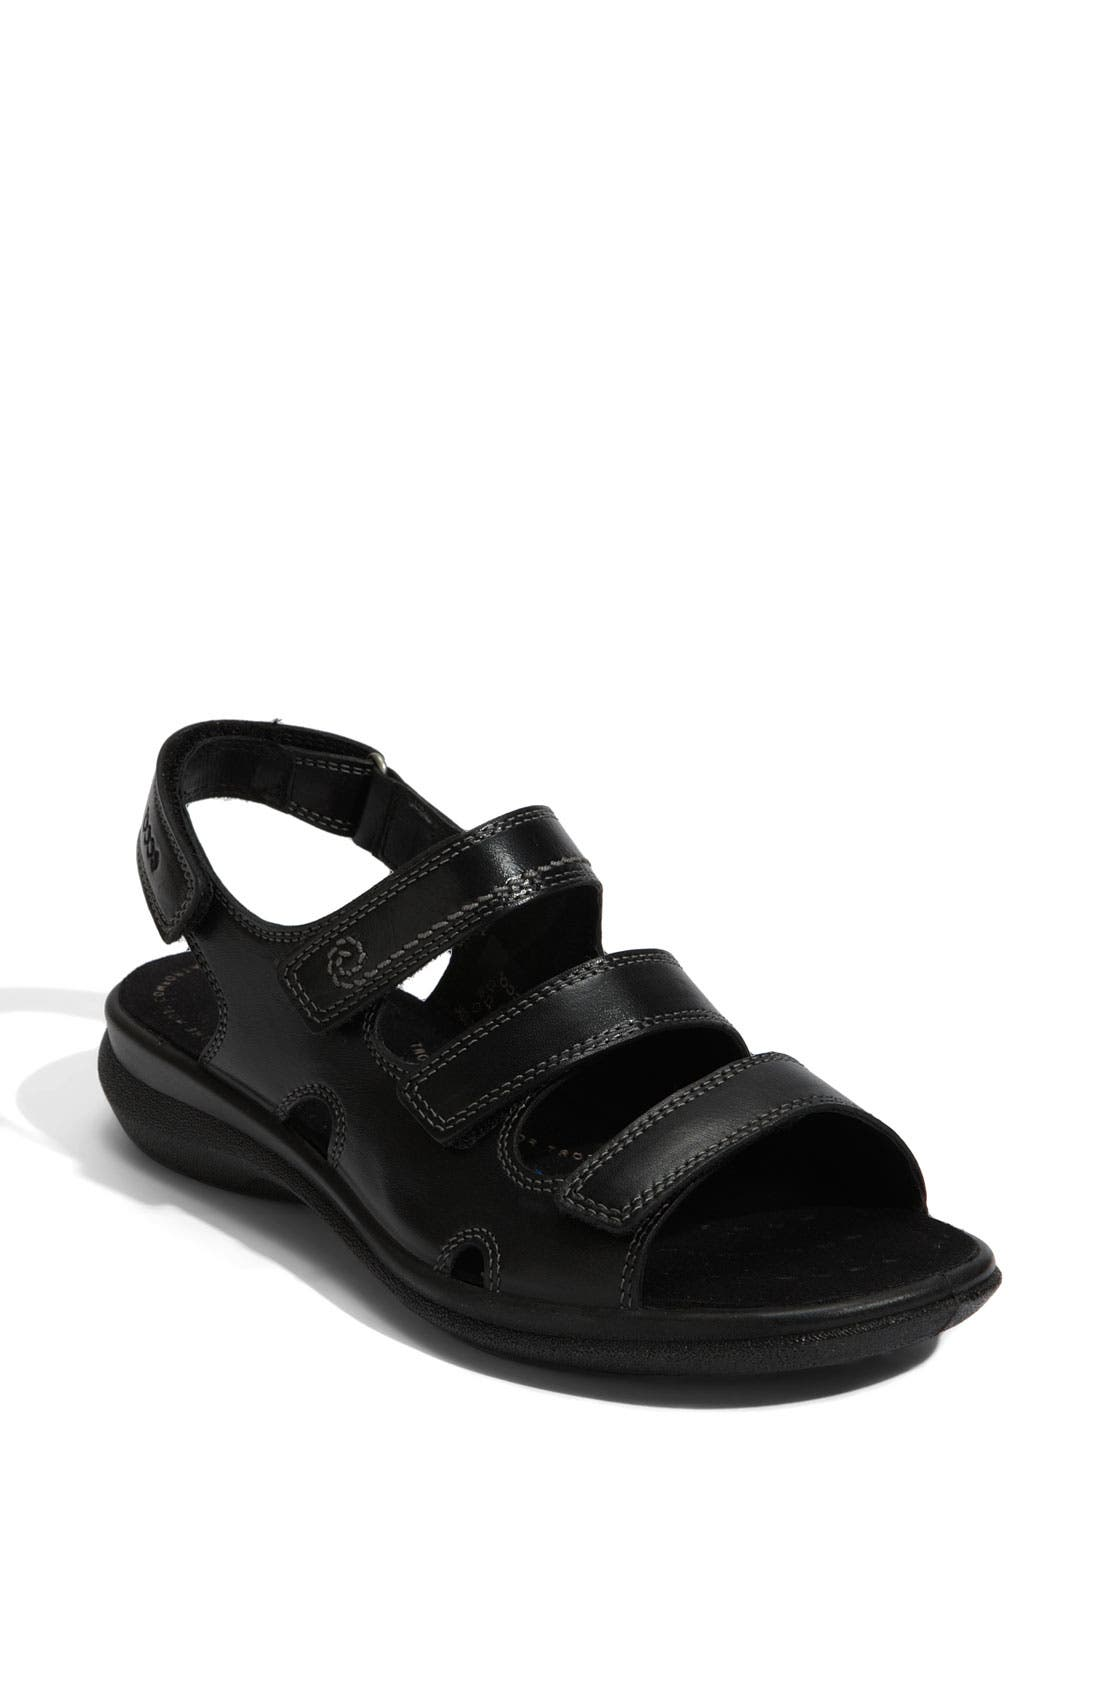 Main Image - ECCO 'Breeze' Sandal